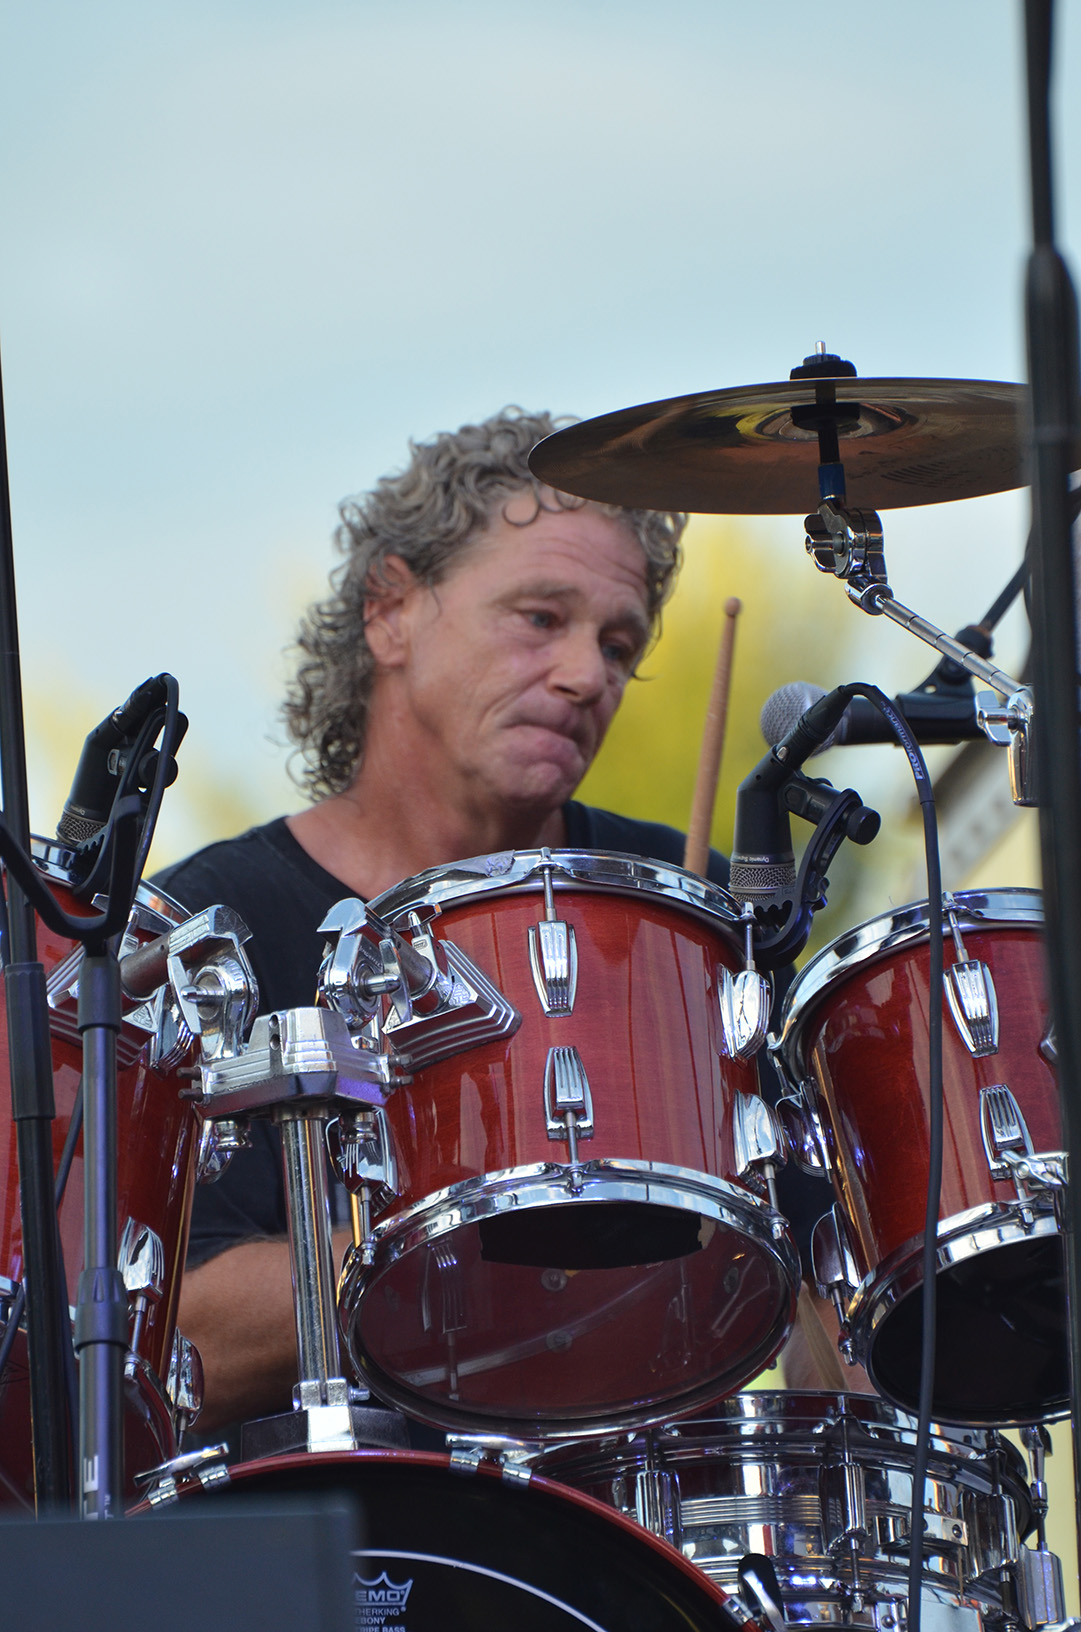 Tim Seay